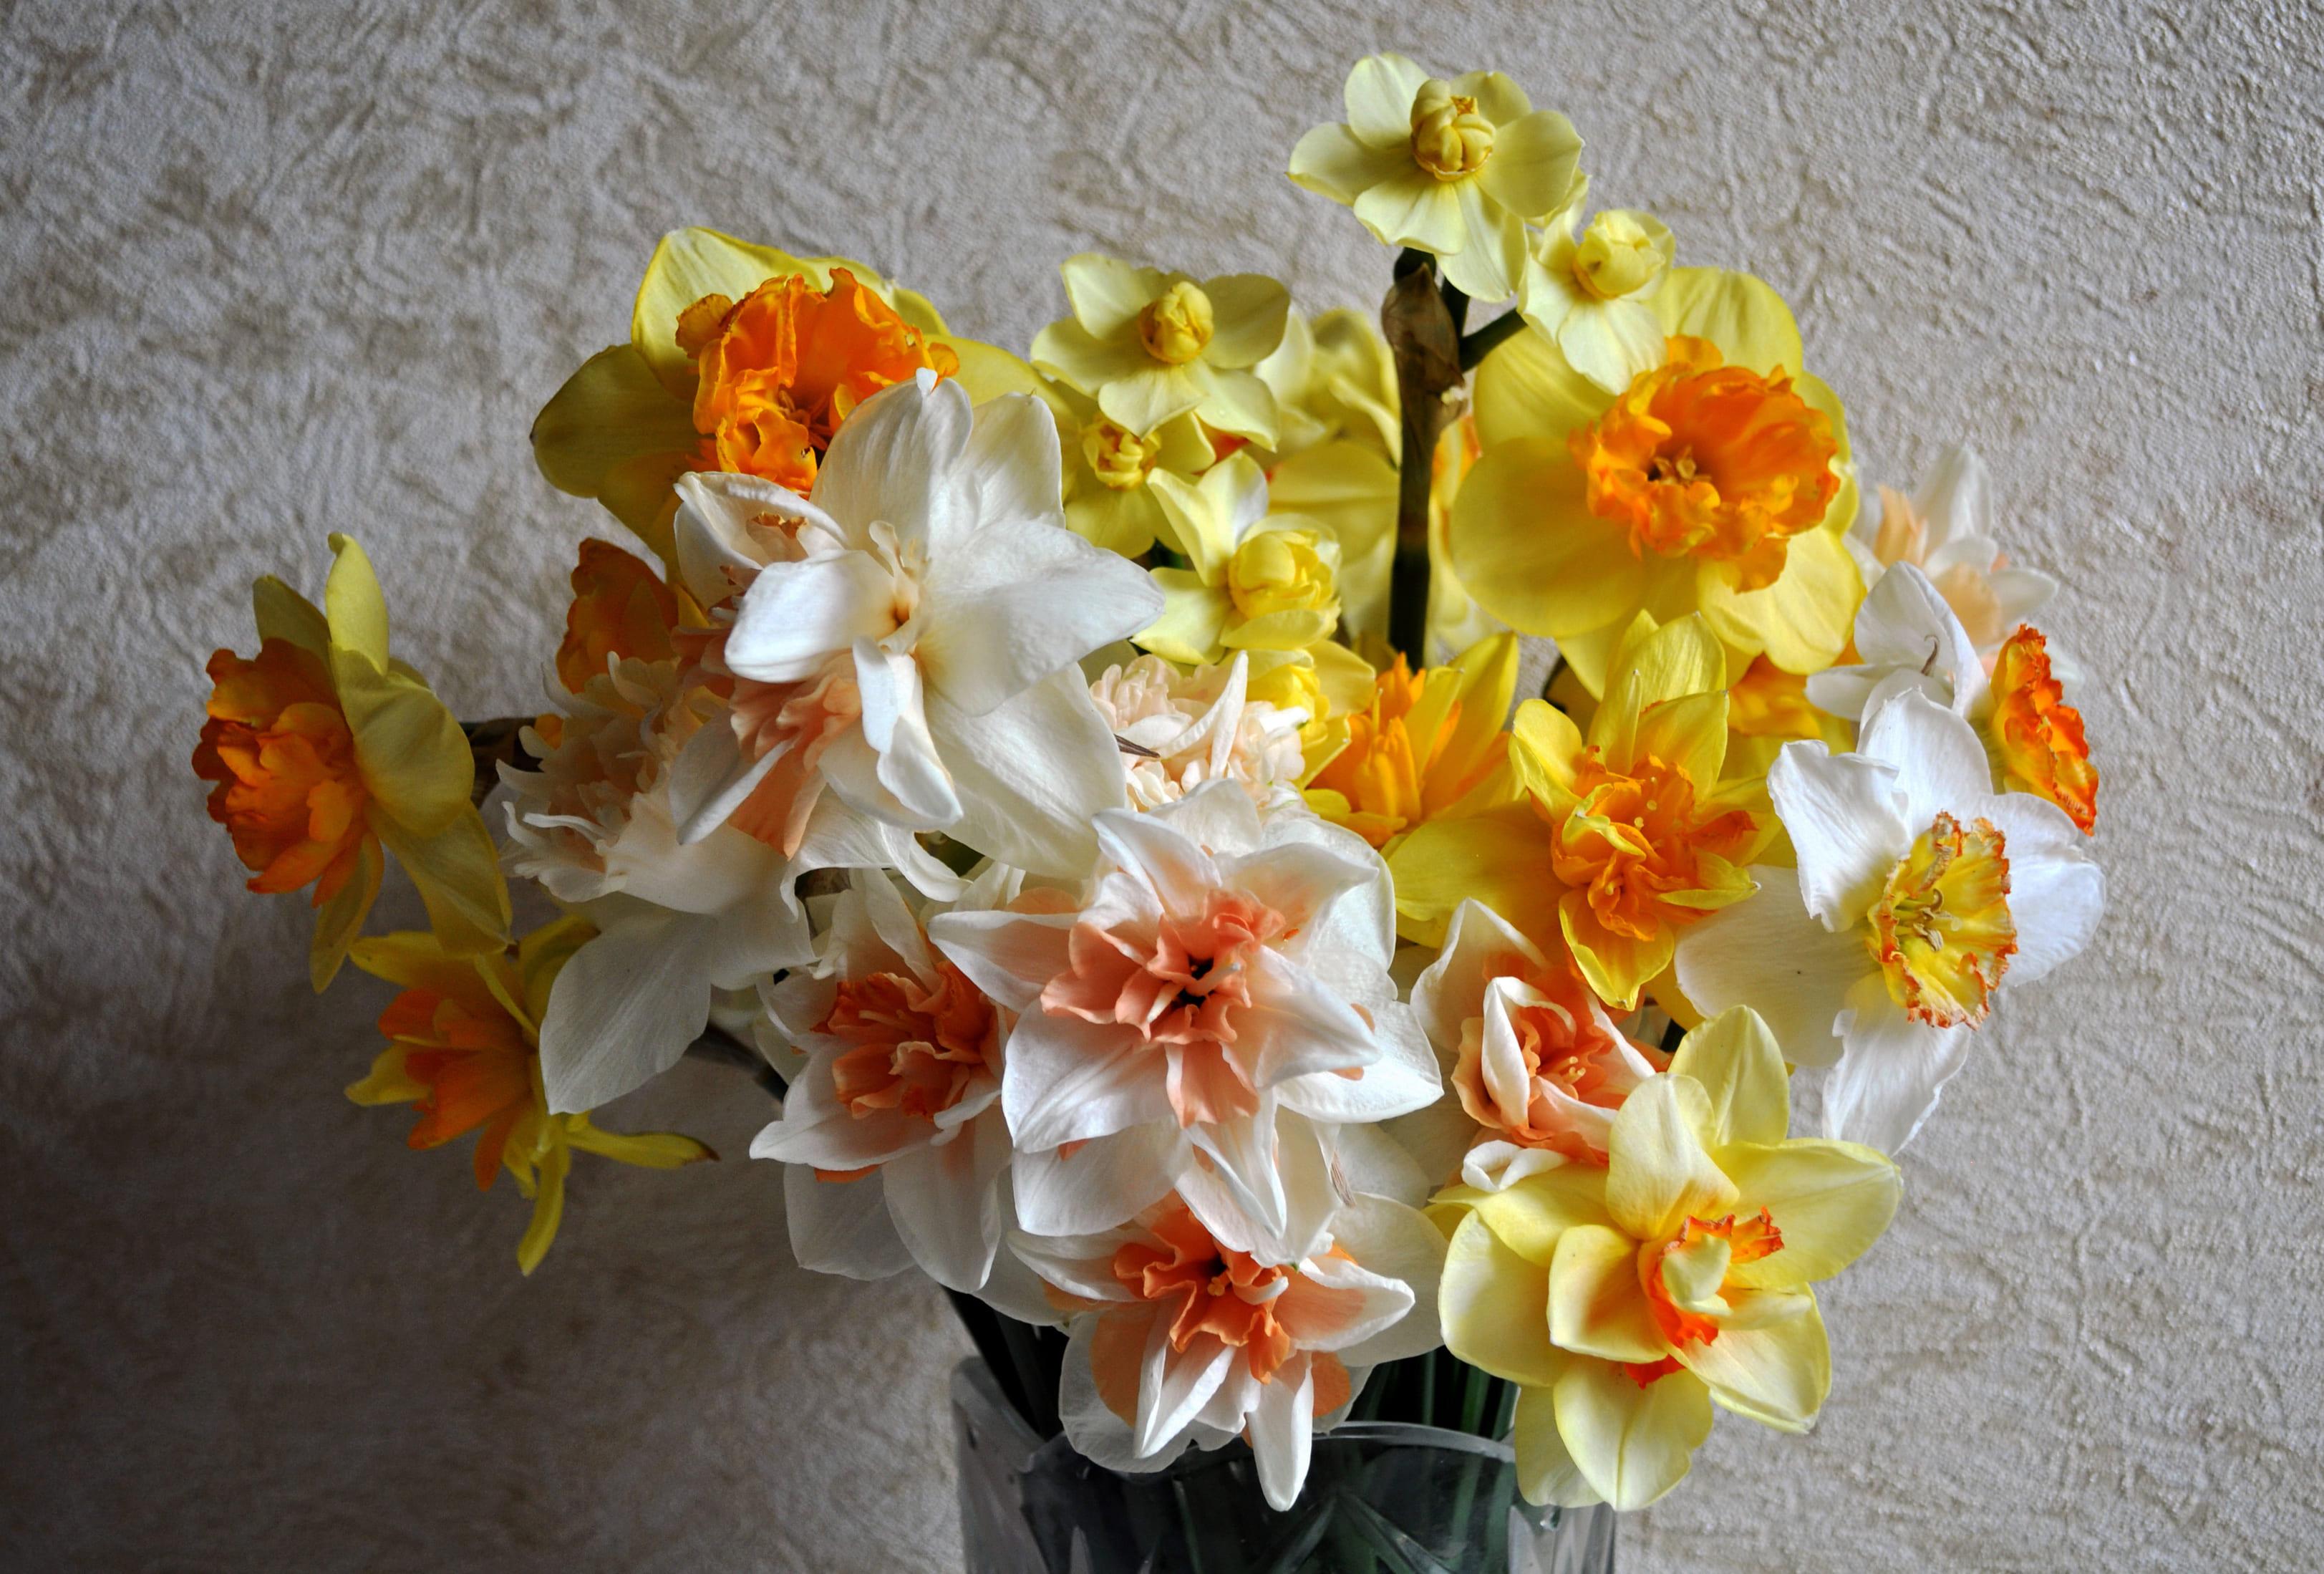 daffodils-photo-27